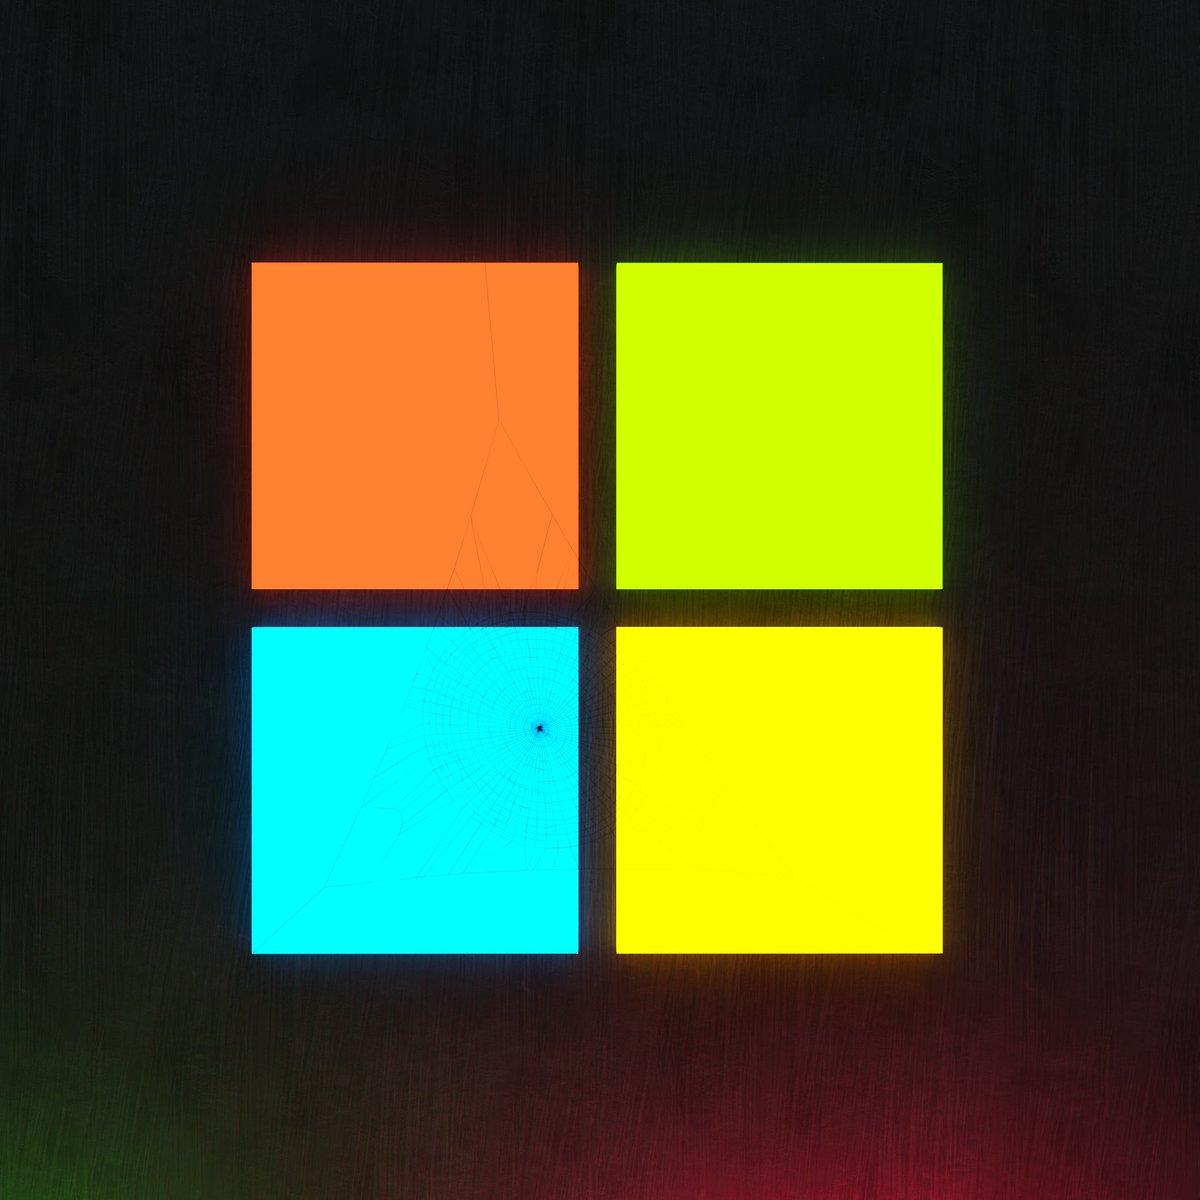 Microsoft photo